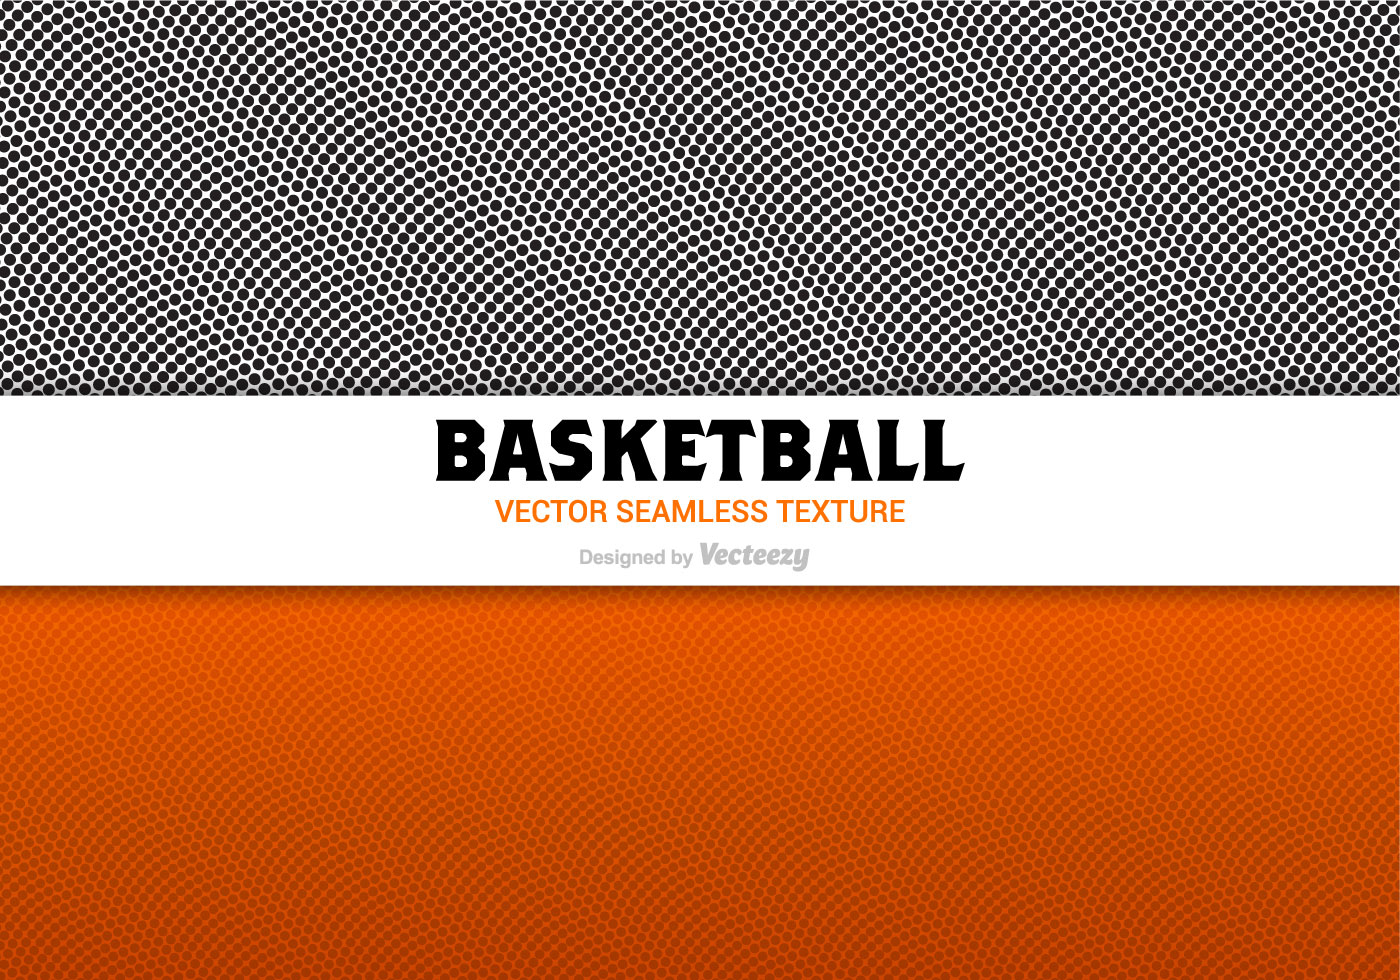 Black Textured Wallpaper Free Basketball Texture Vector Download Free Vector Art